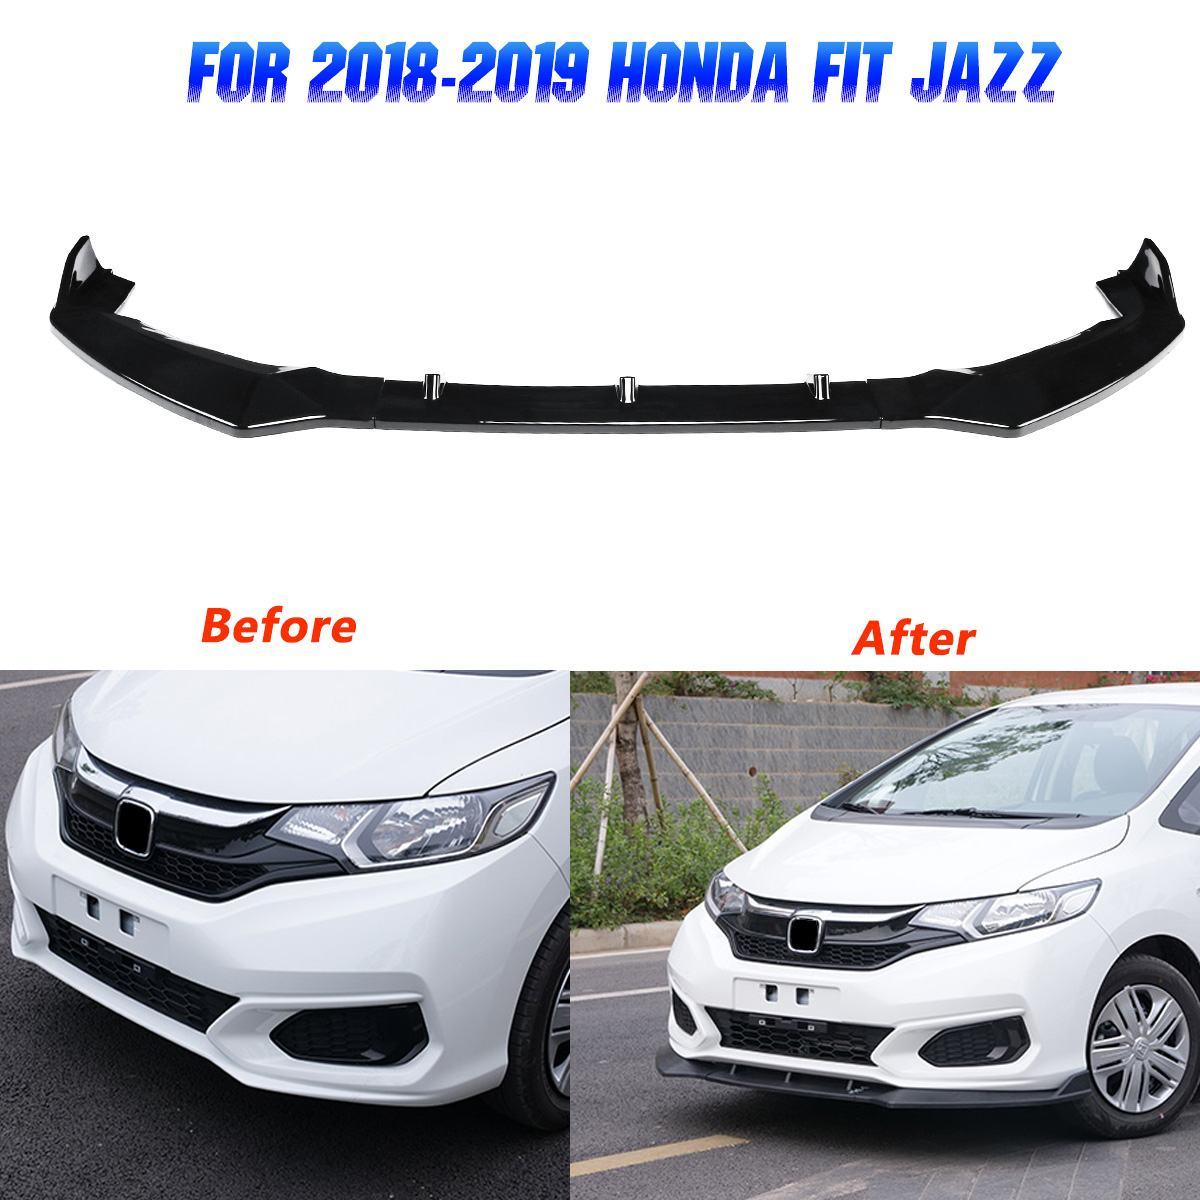 For Toyota Solara 2004-2008 K-Metal Front Bumper Reinforcement